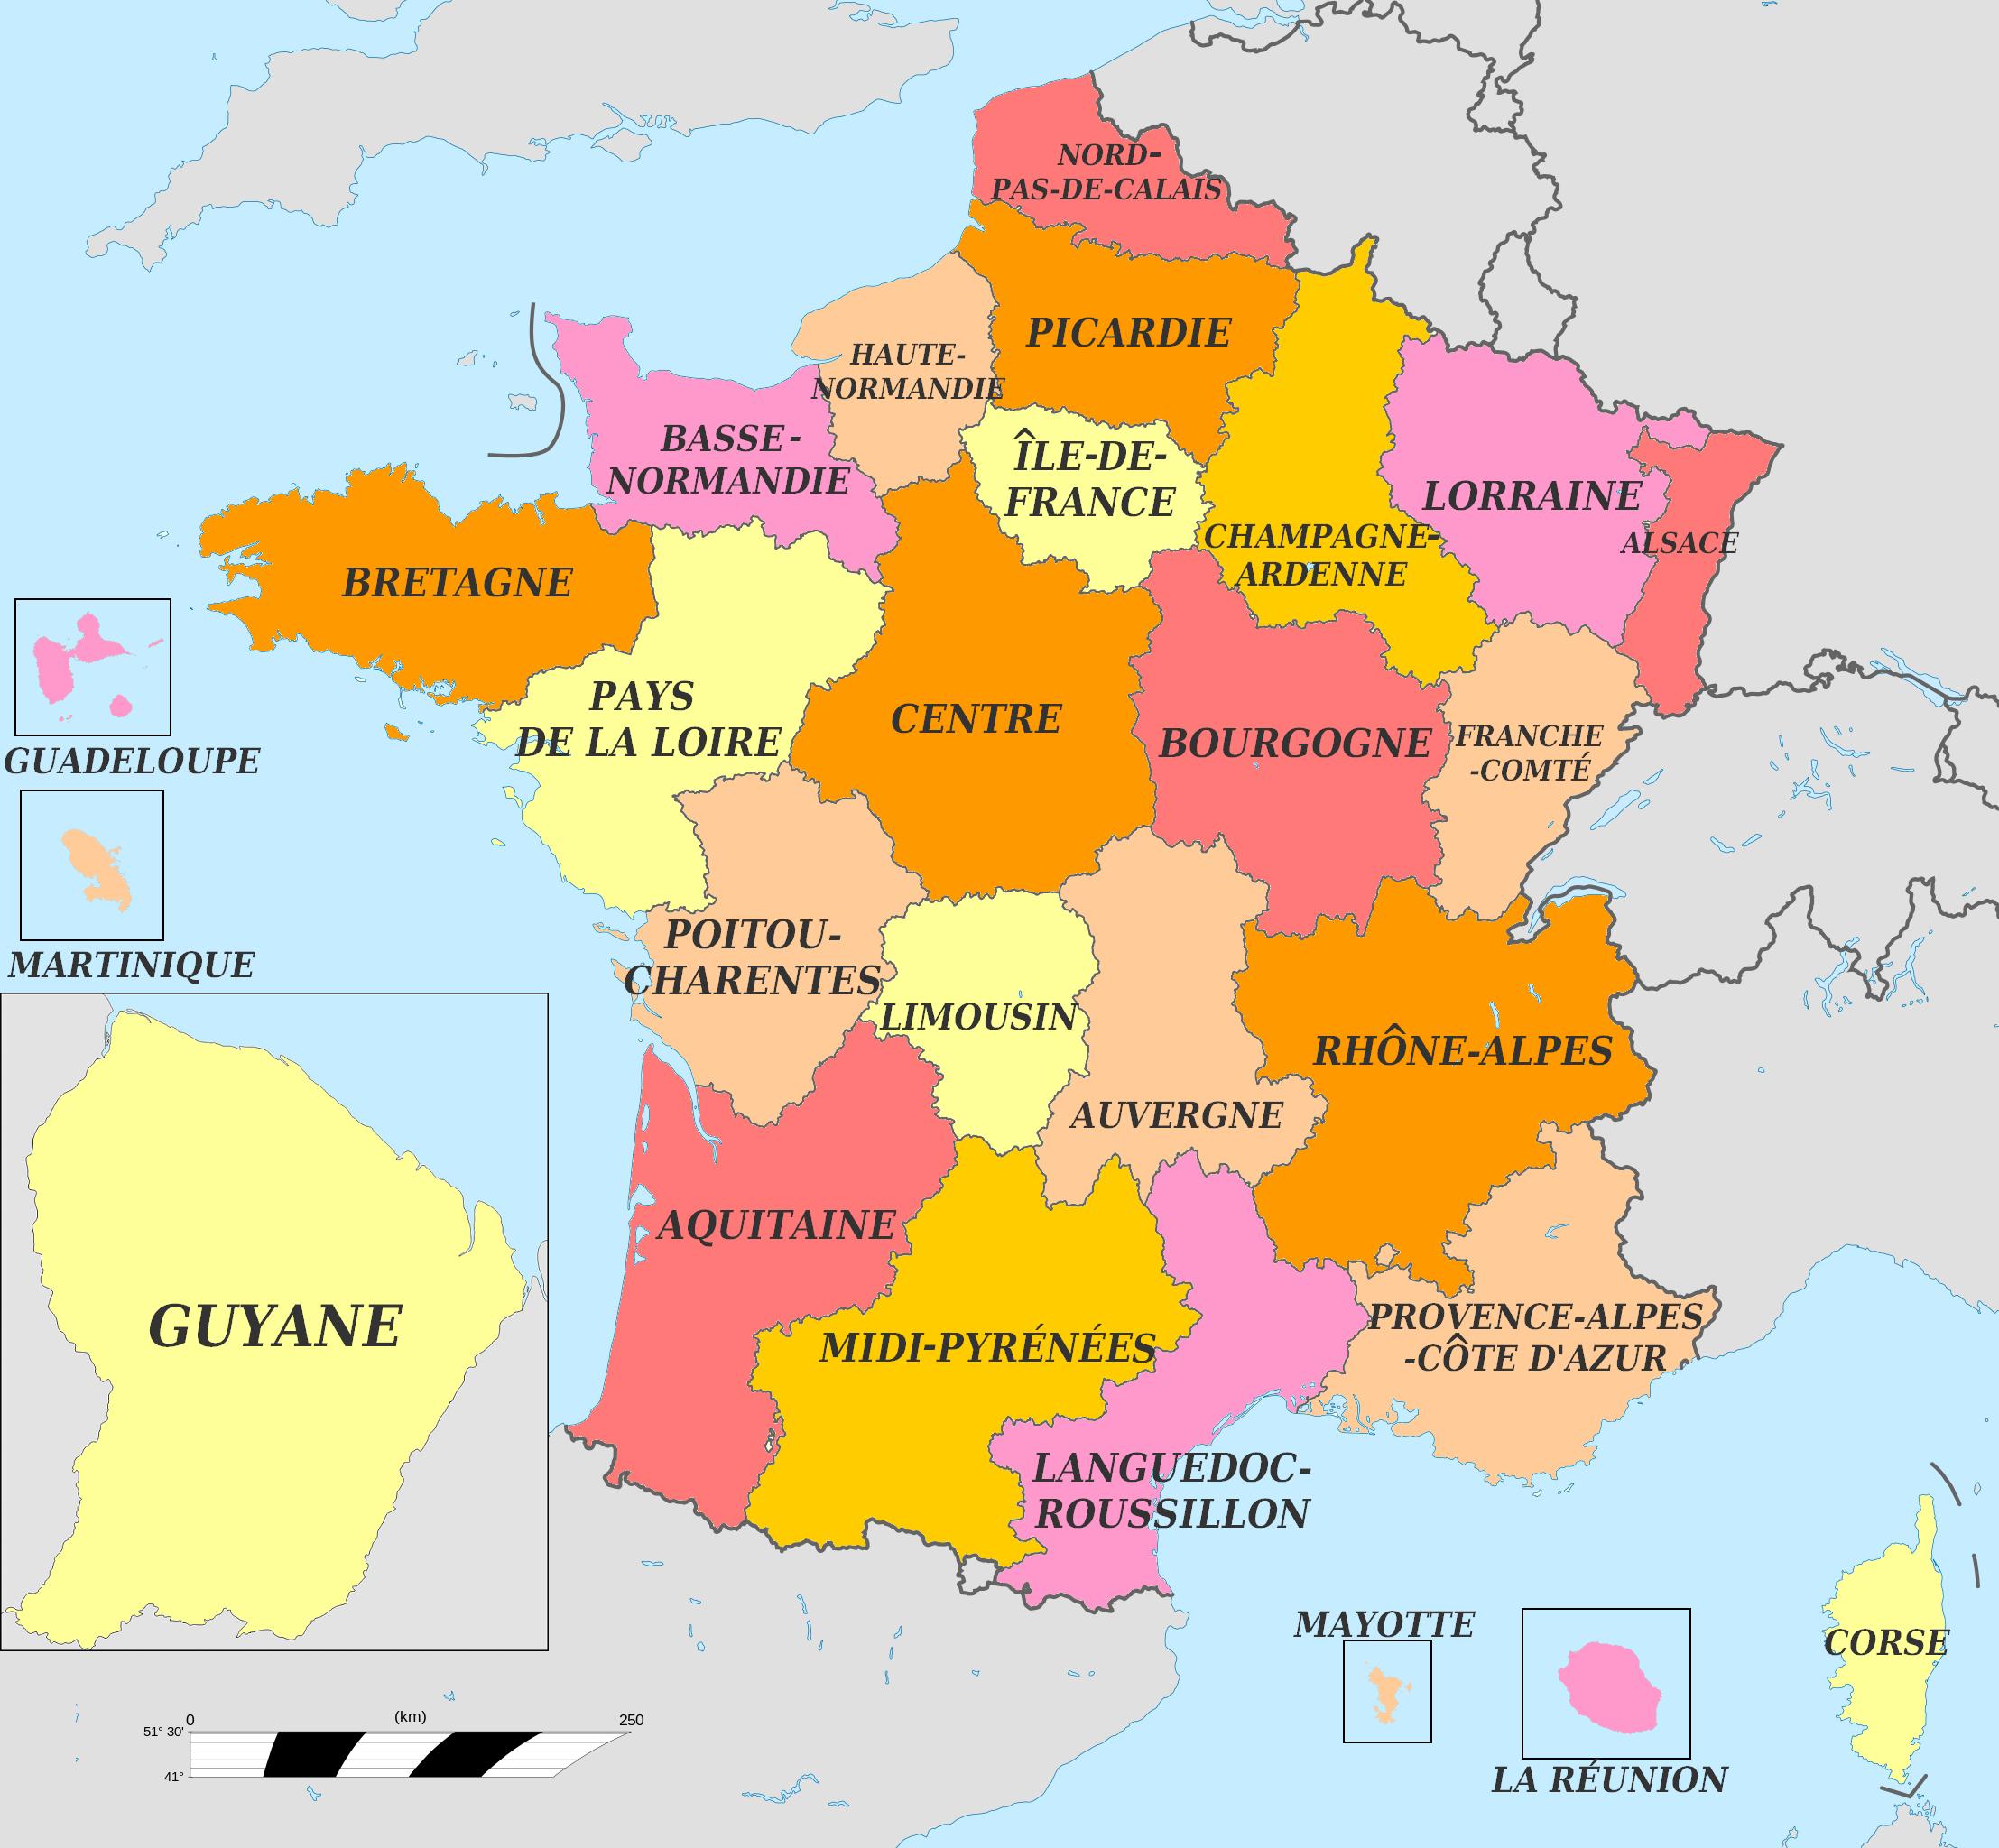 File:Map Carte des Anciennes Régions 2015.png - Wikimedia Commons